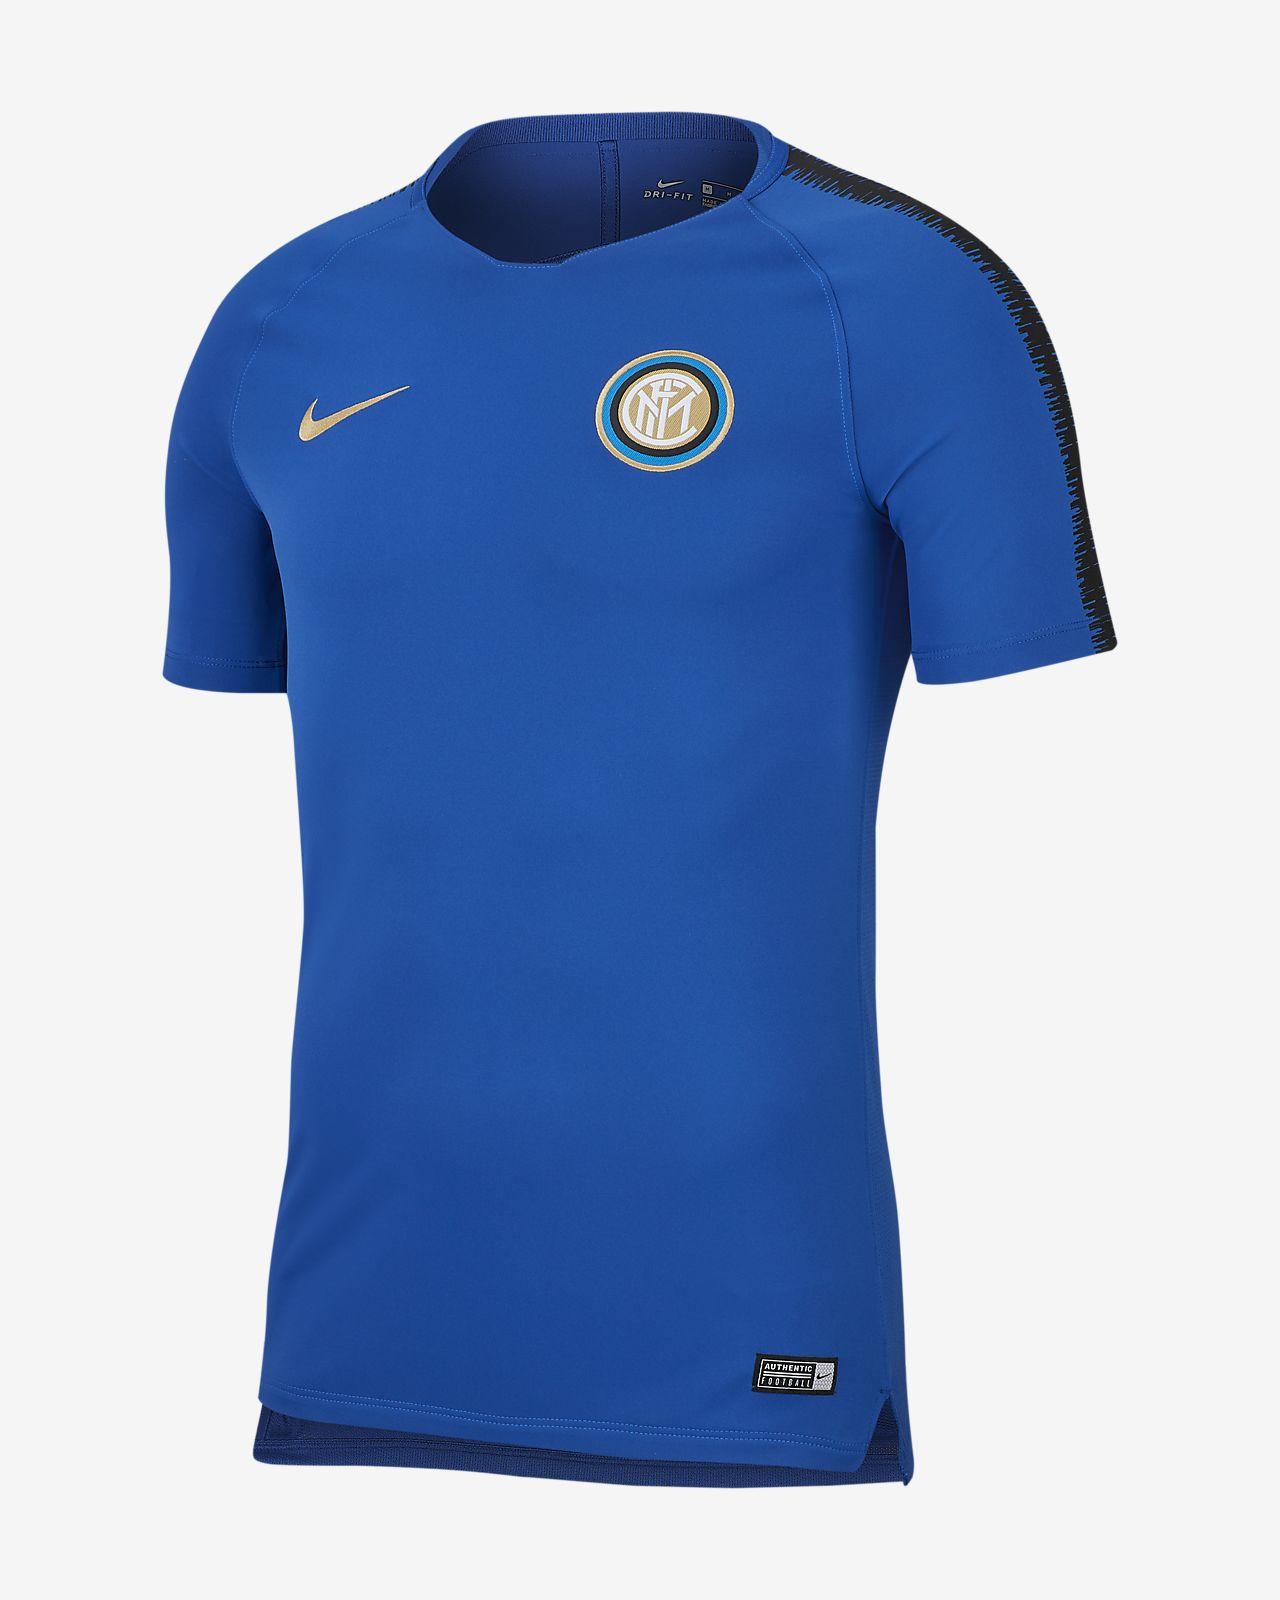 12fbe158a Nike Inter Milan Breathe Stadium Jersey Away - maglia calcio - uomo ... maglia  milan nike